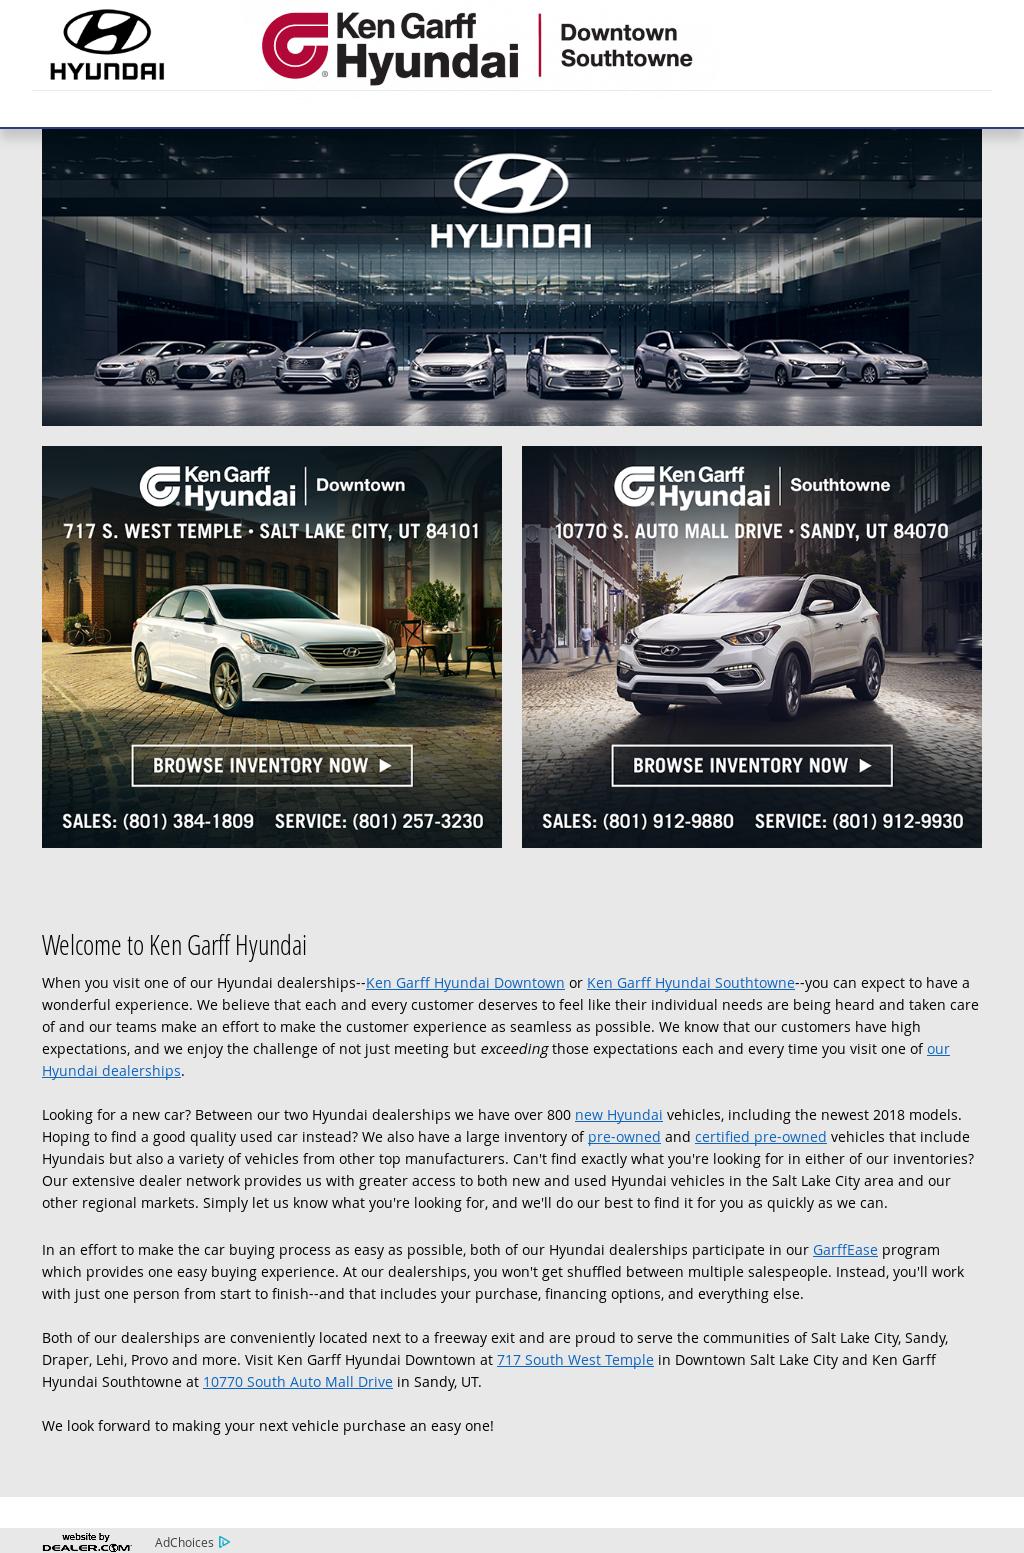 Ken Garff Hyundai Website History